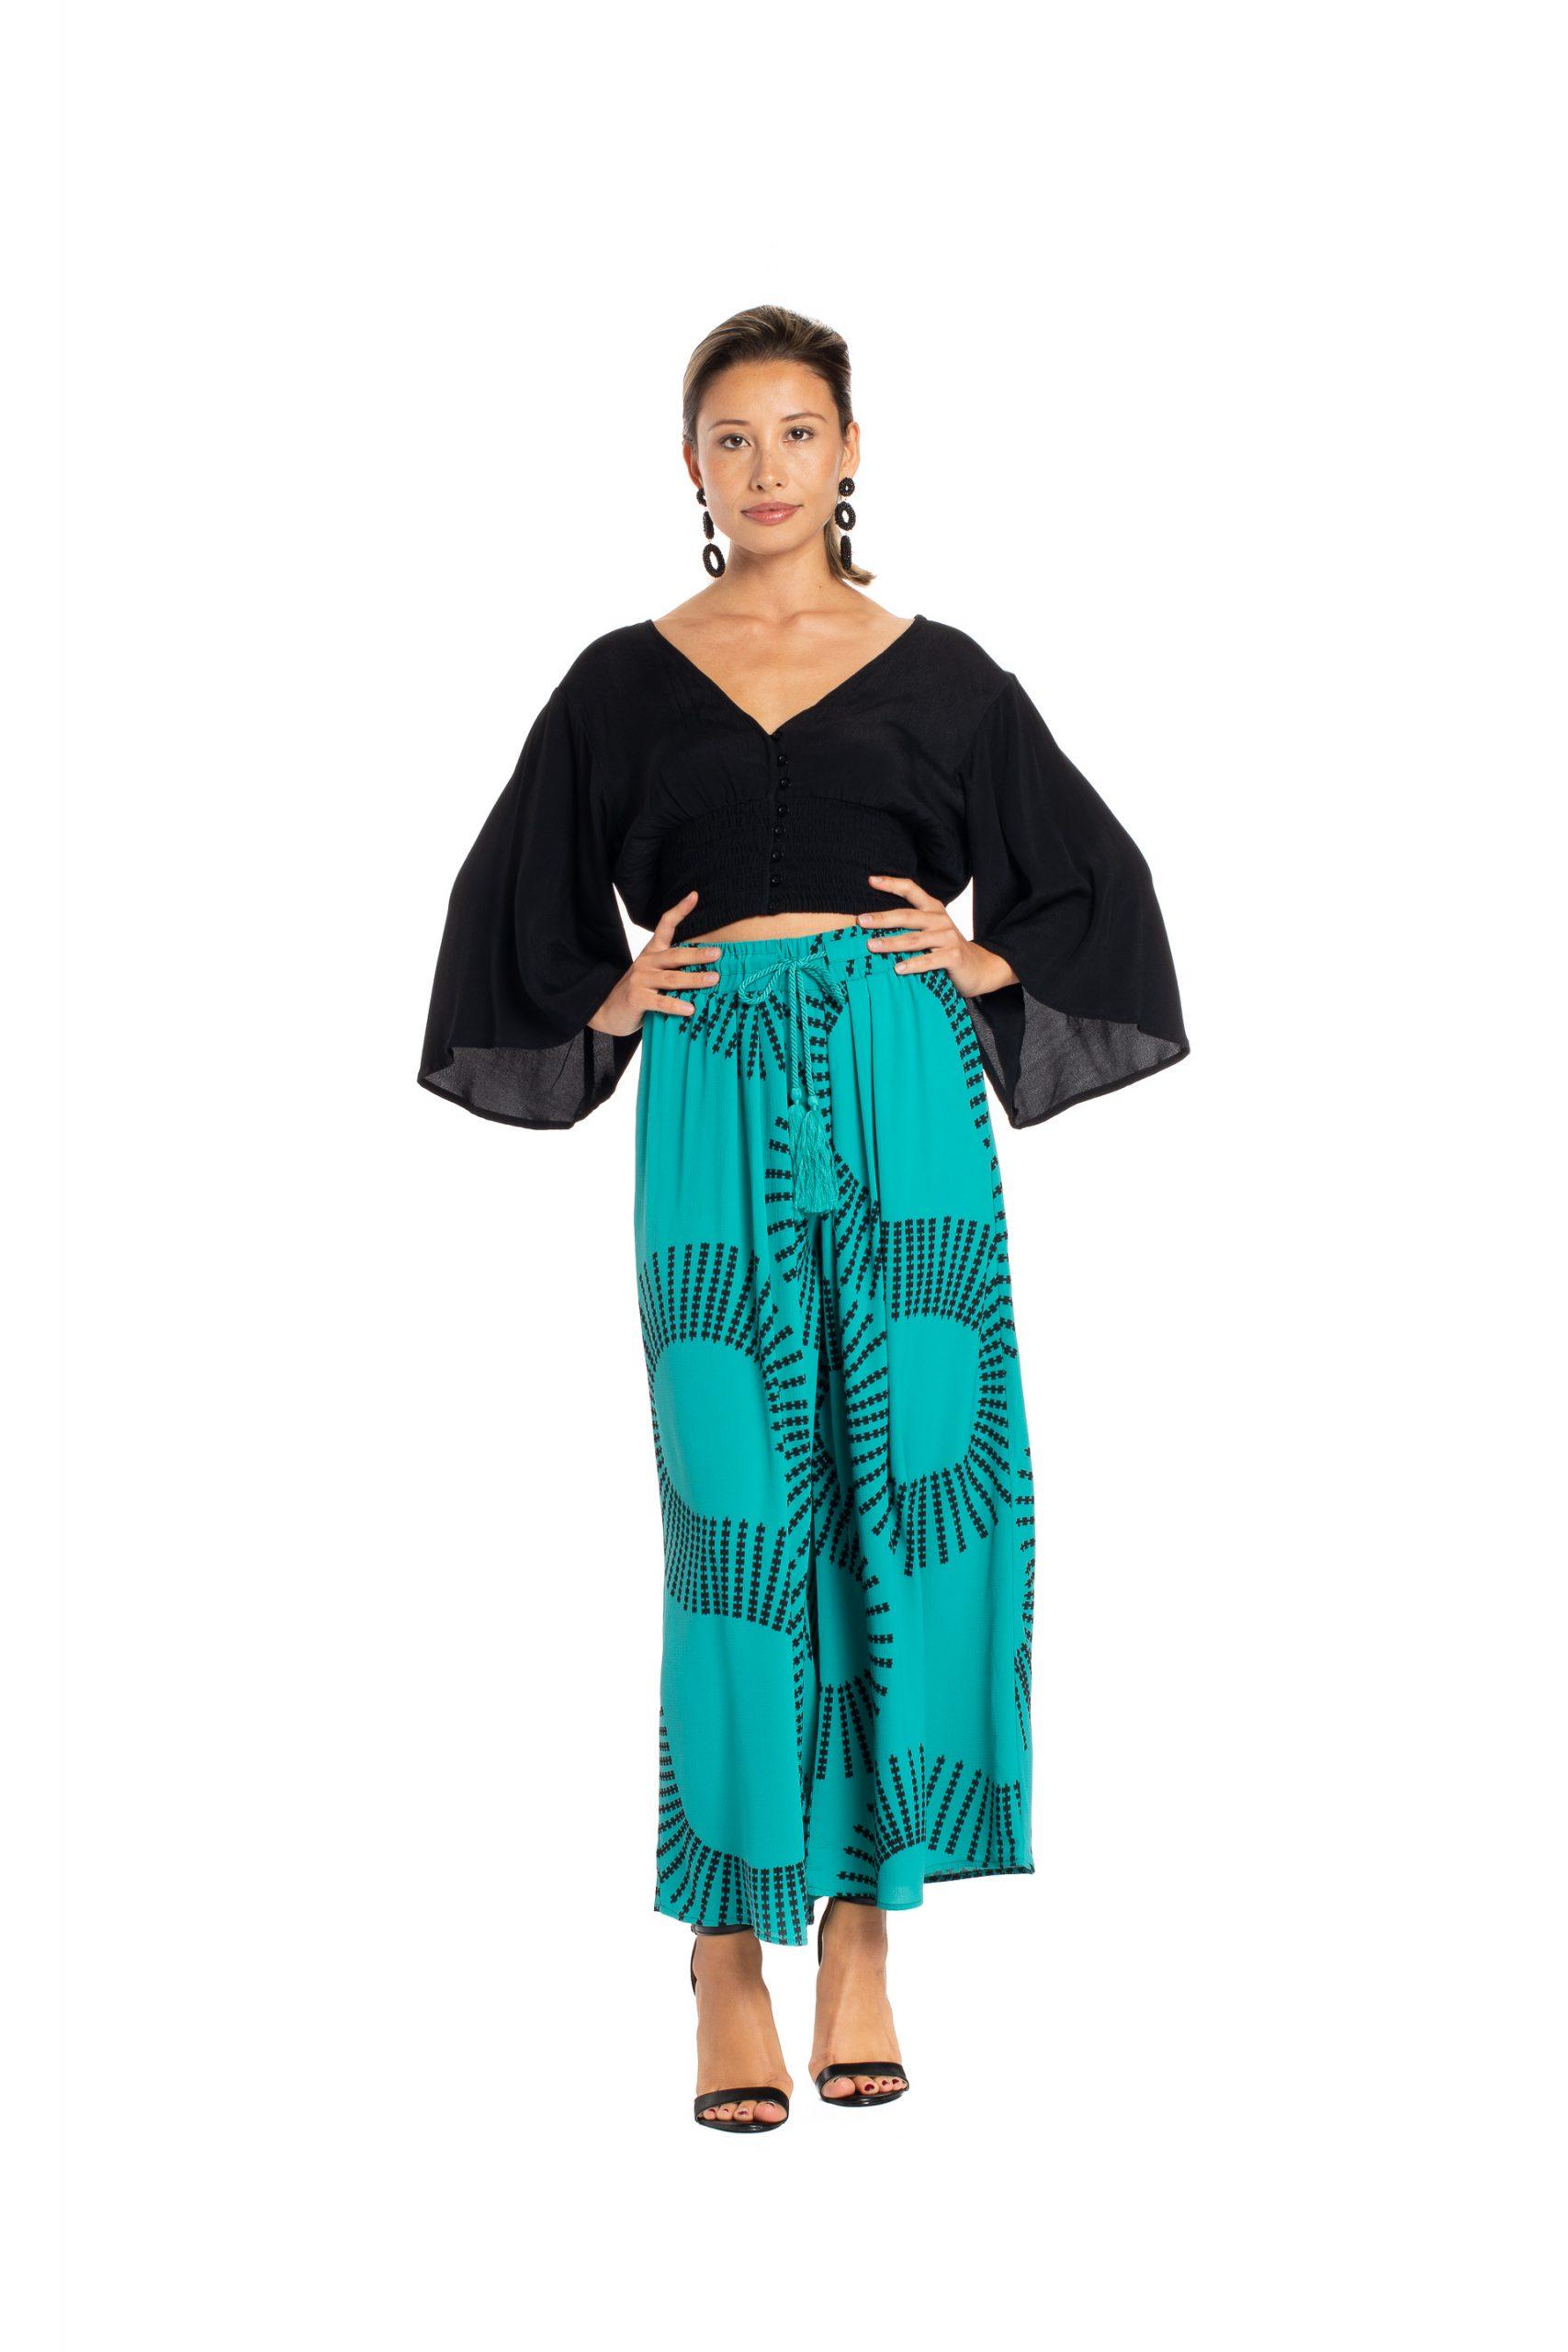 Model wearing Kapakai Flow Pant in Blue Grass - Front View